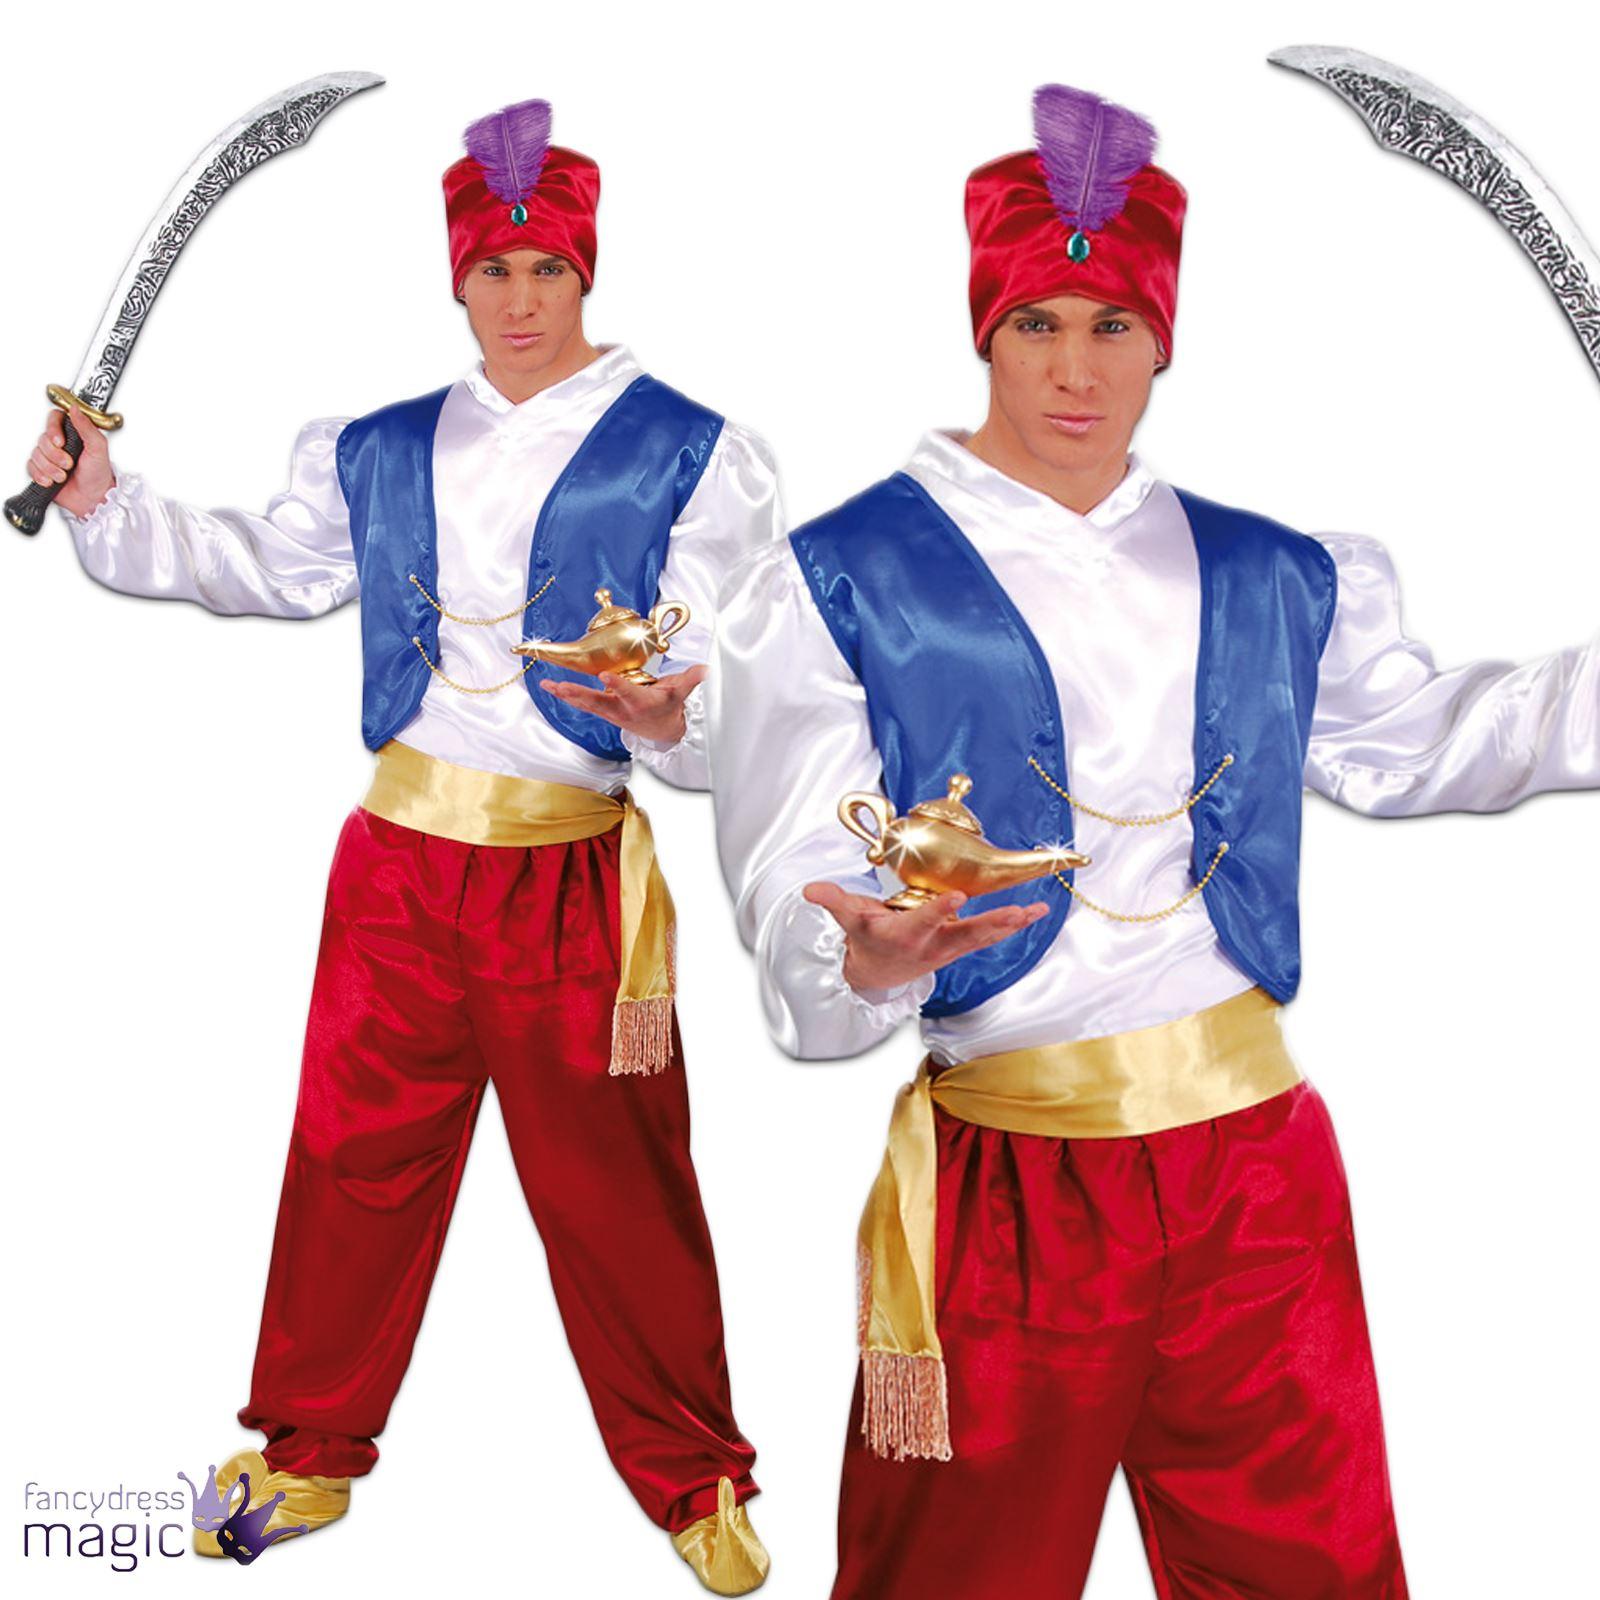 Adult Genie Ali Baba Aladdin Bollywood Arabian Panto Fancy Dress Costume Outfit  sc 1 st  eBay & Adult Genie Ali Baba Aladdin Bollywood Arabian Panto Fancy Dress ...